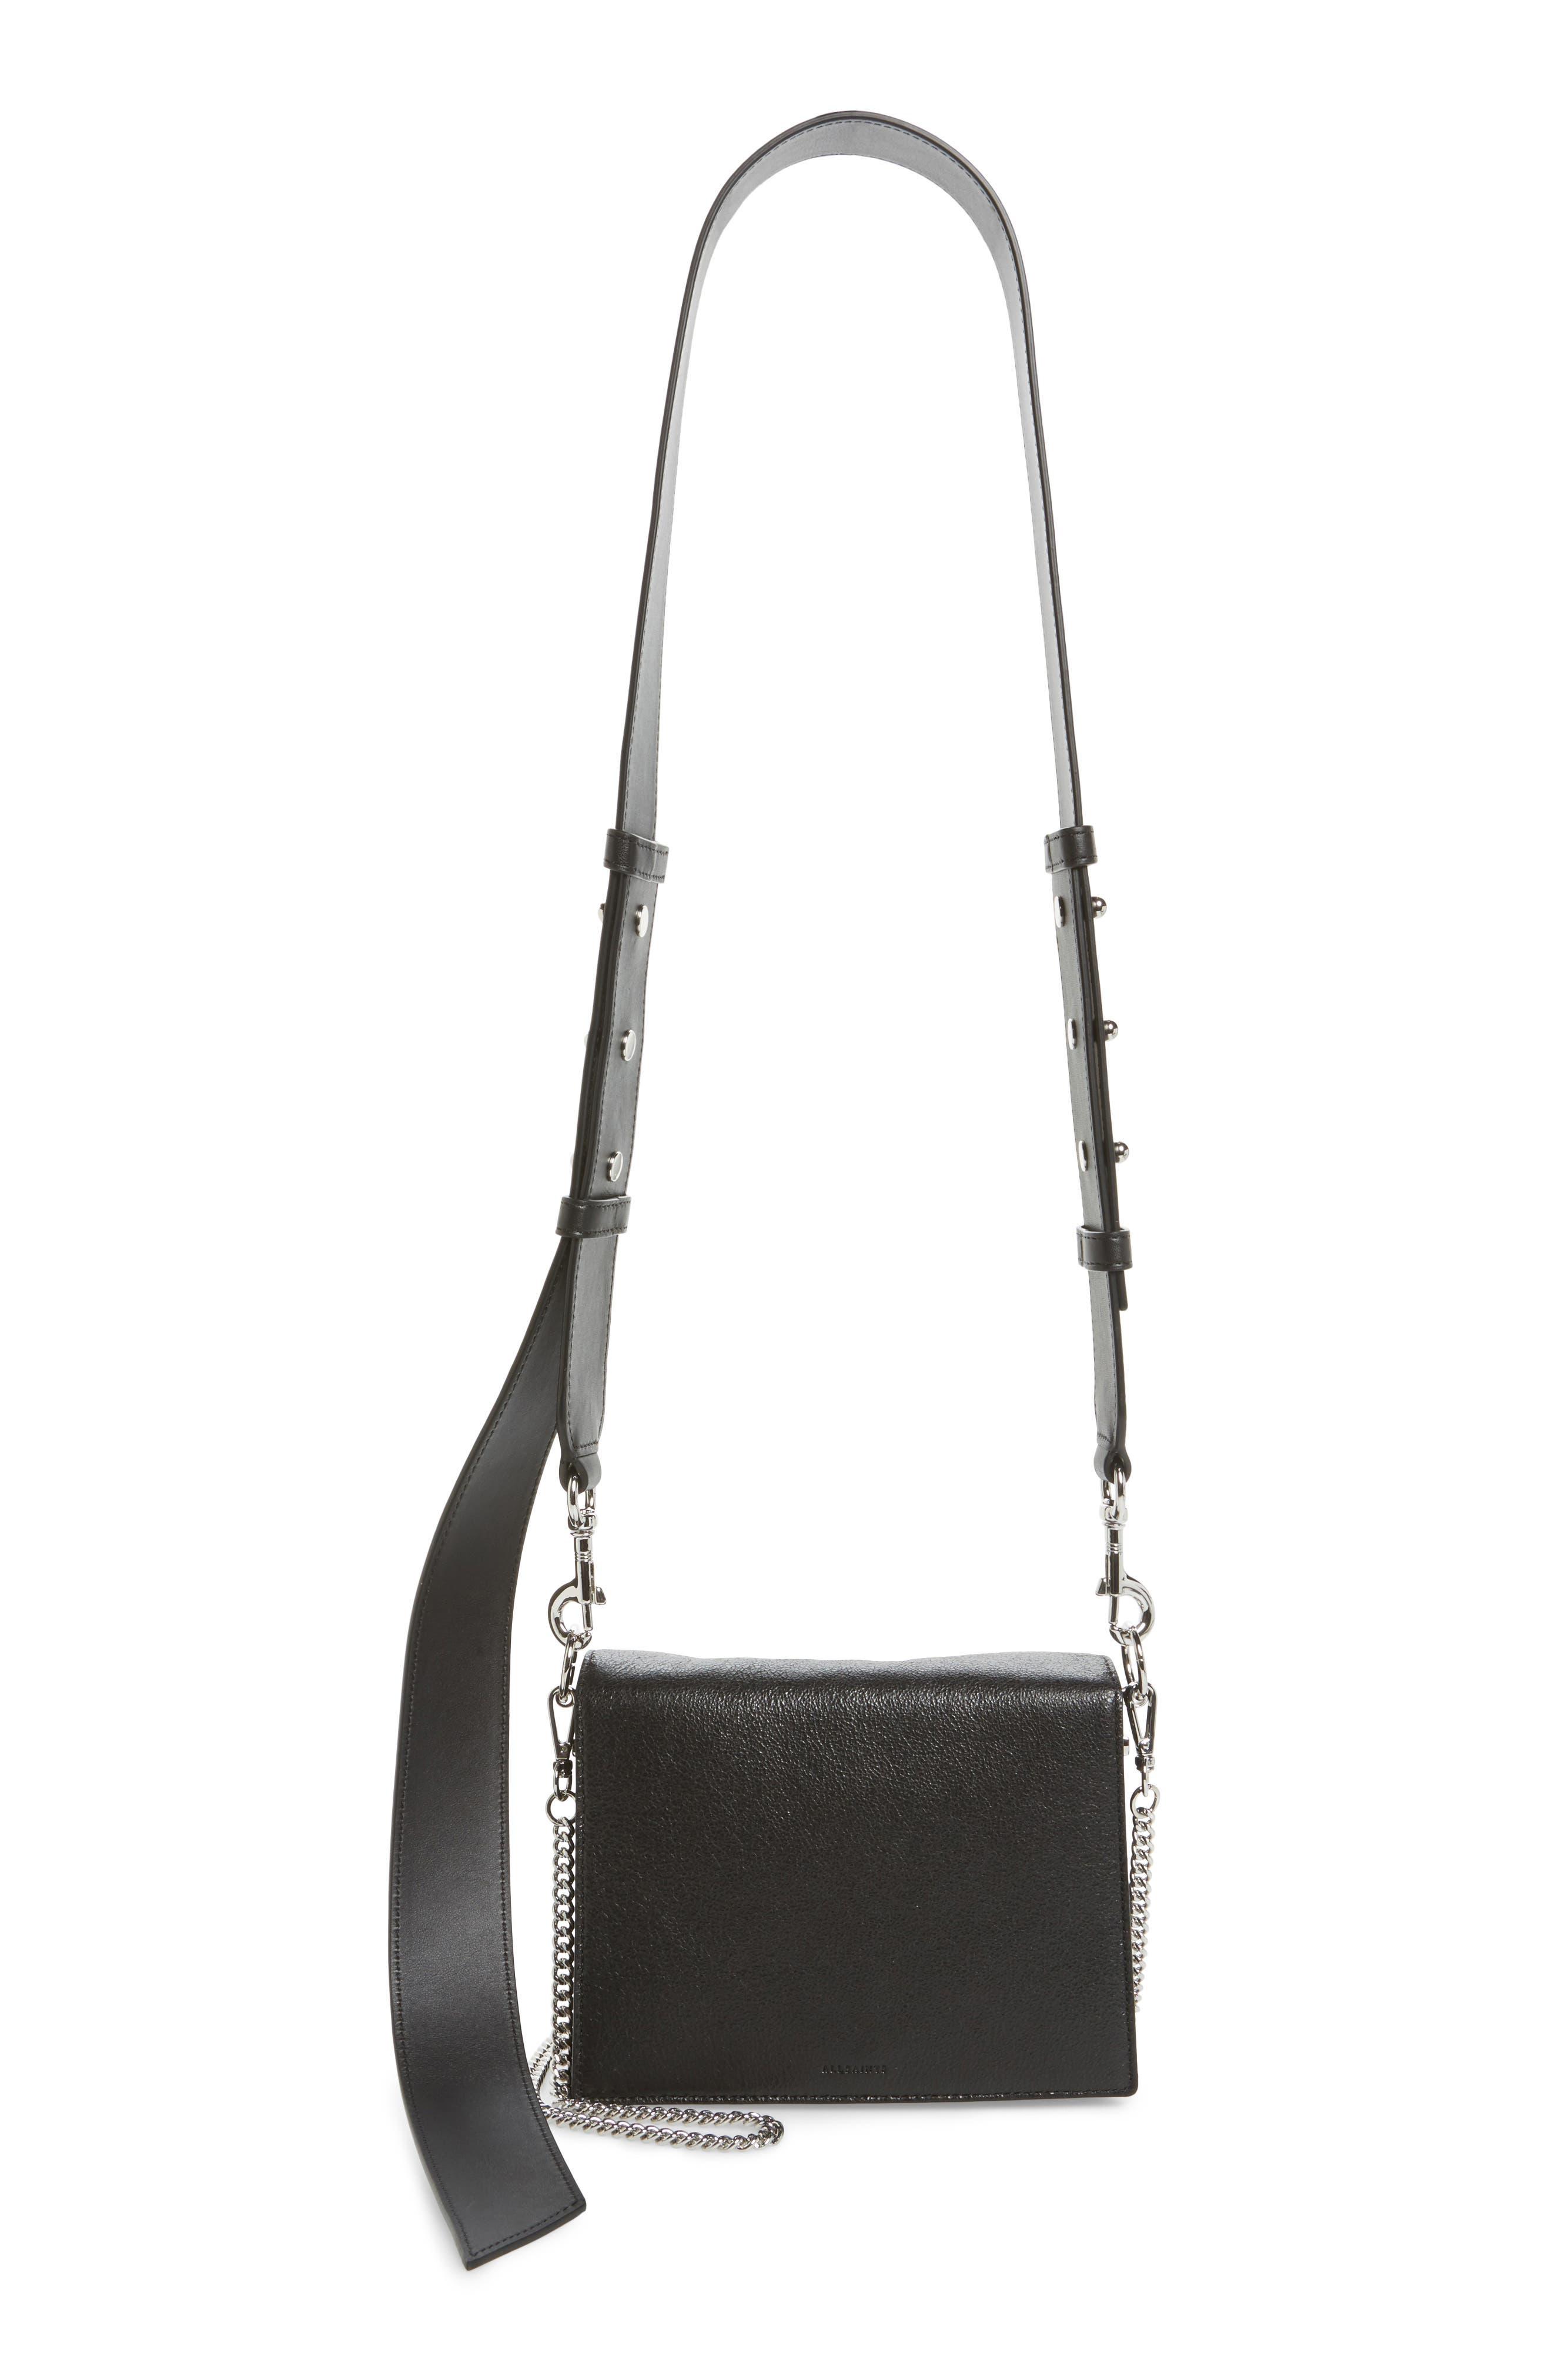 Zep Leather Shoulder Bag,                             Main thumbnail 1, color,                             001